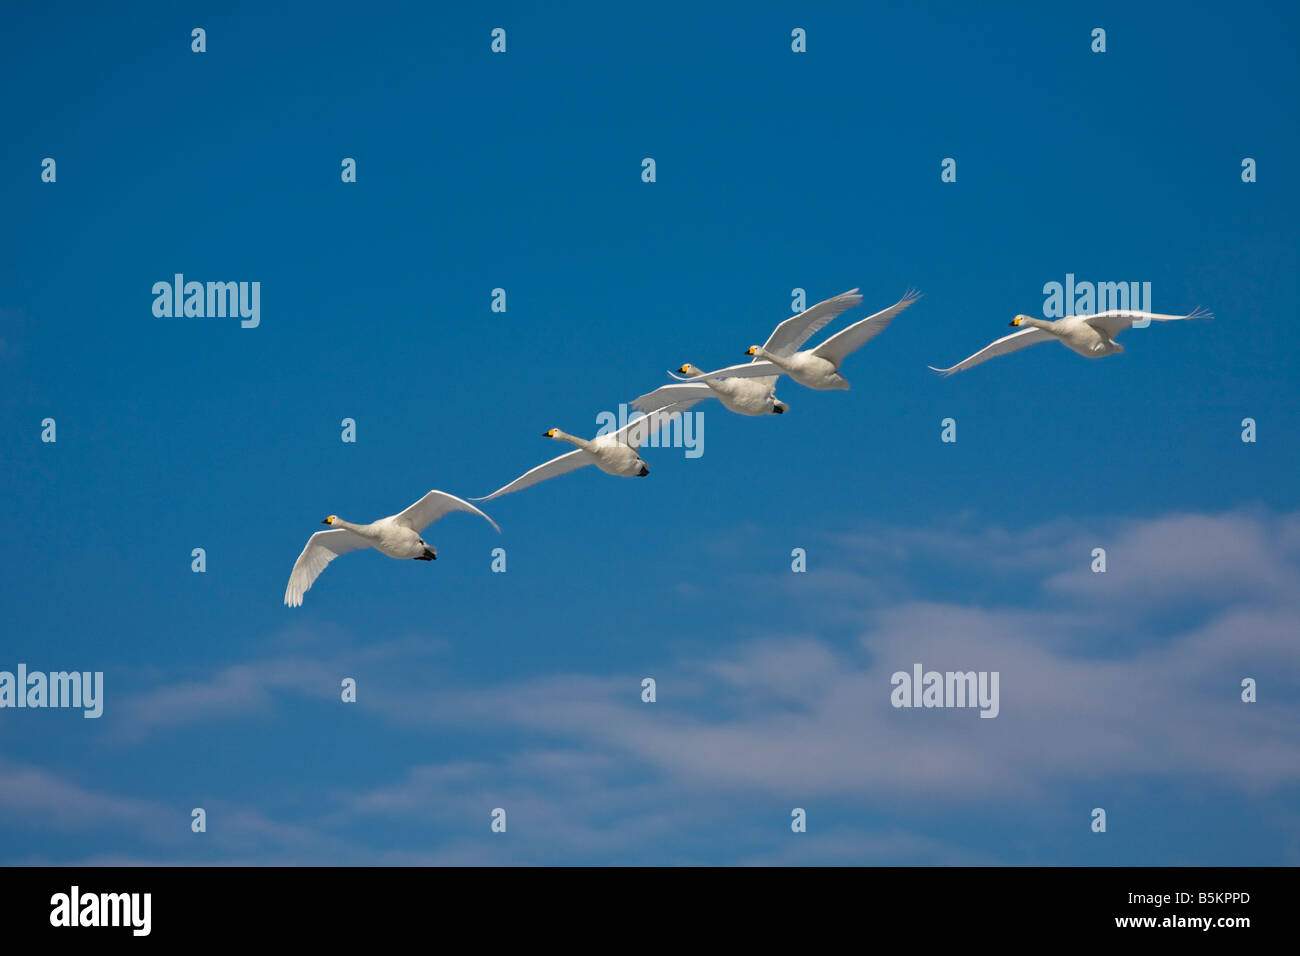 Hokkaido Japan Whooper Swans Cygnus cygnus flying in a formation over Lake Kussharo Akan National Park - Stock Image